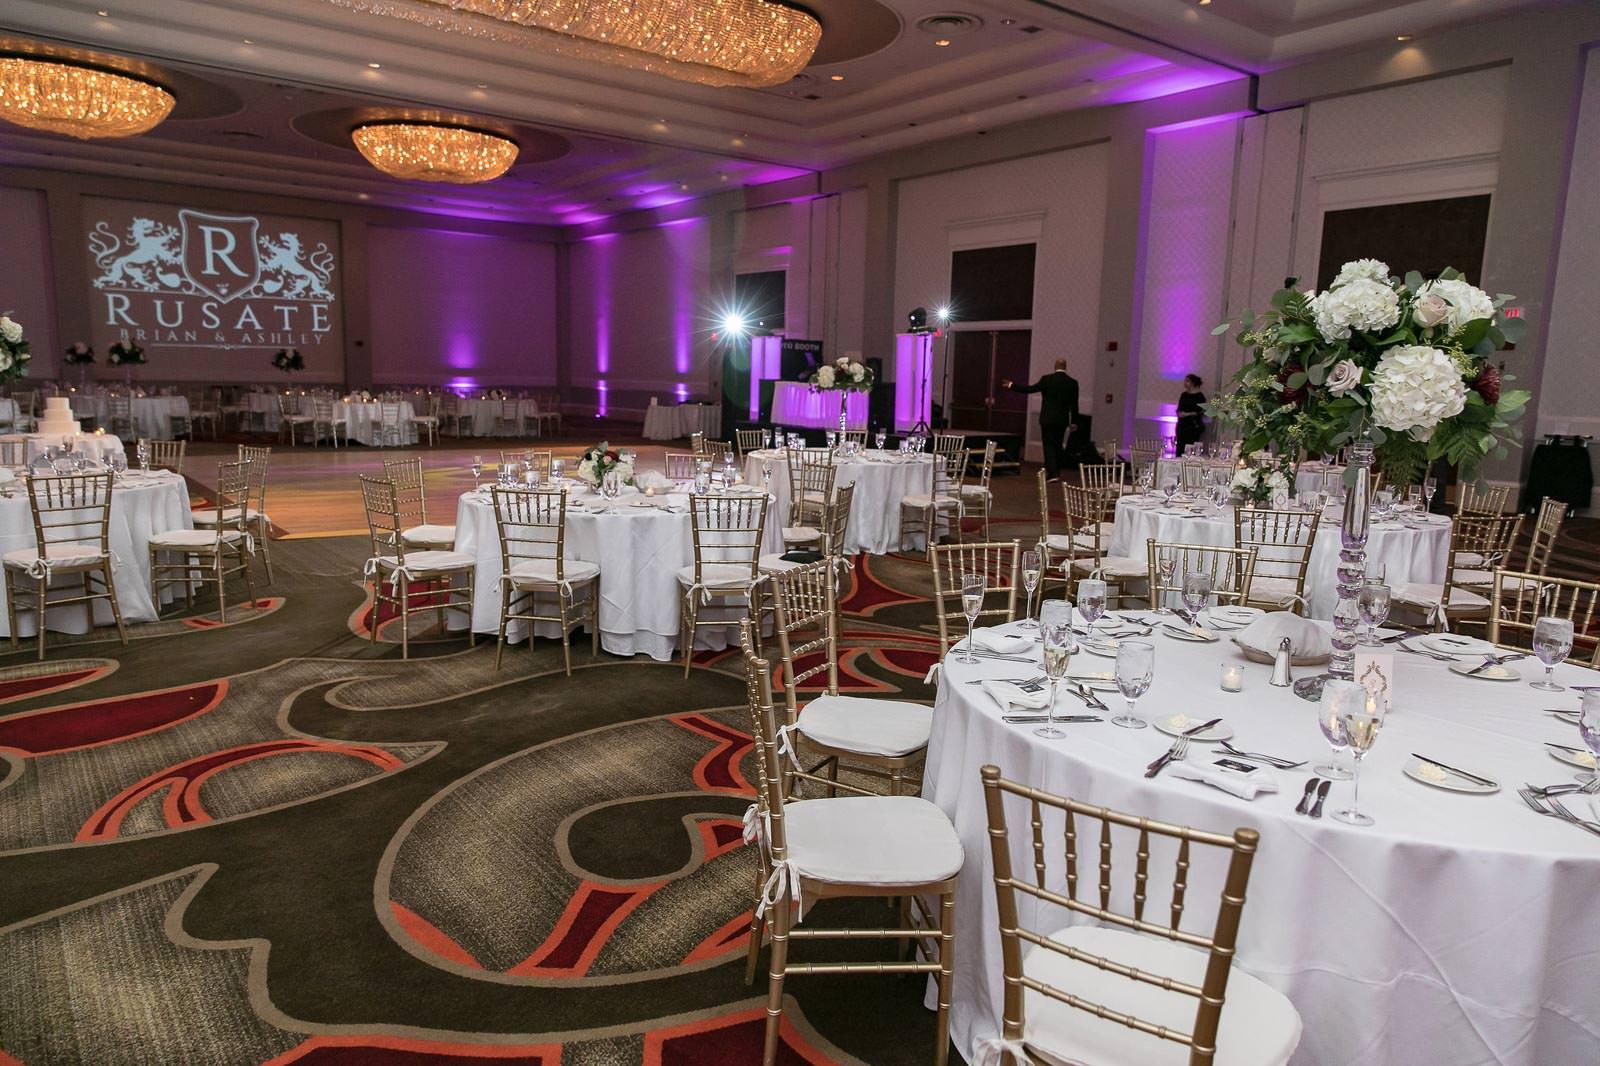 Omni Hotel Providence, Omni, Providence, Rhode Island, RI, Wedding, city wedding, November wedding, Tracy Jenkins Photography, RI wedding photographer, Rhode Island Wedding photographer, reception